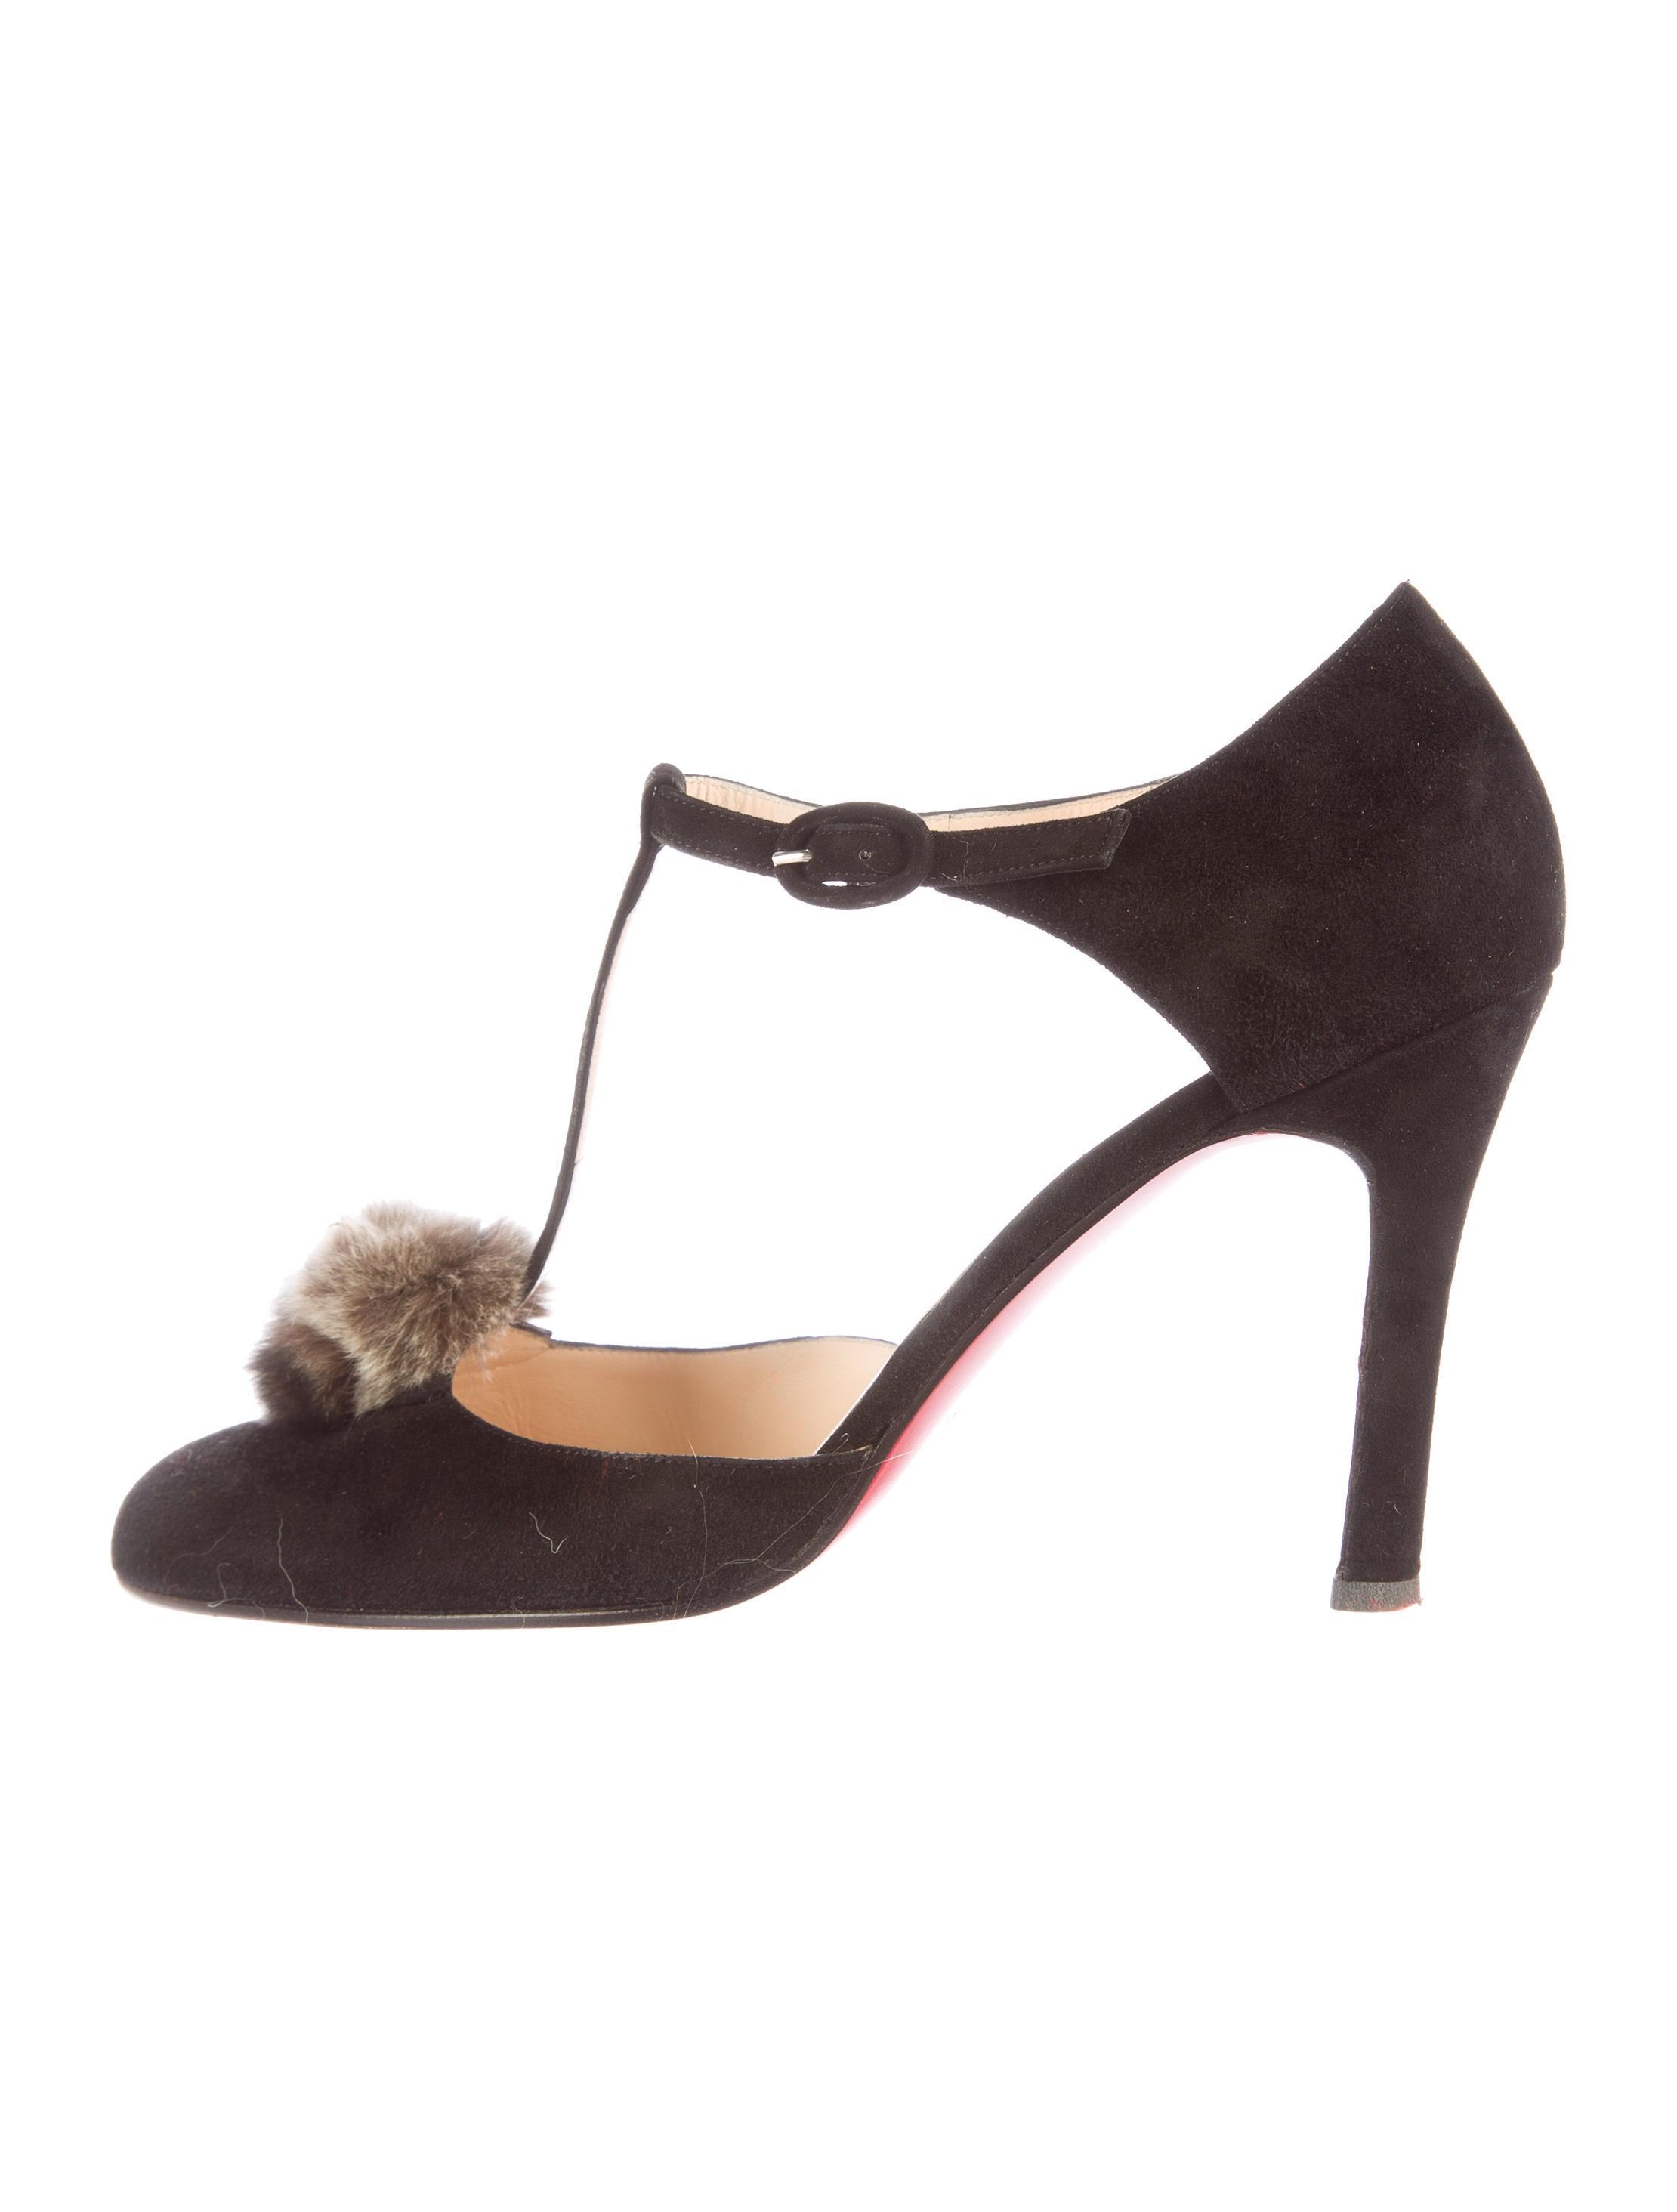 ff4ade3ad5b Christian Louboutin Chinchilla T-Strap Pumps - Shoes - CHT53412 ...